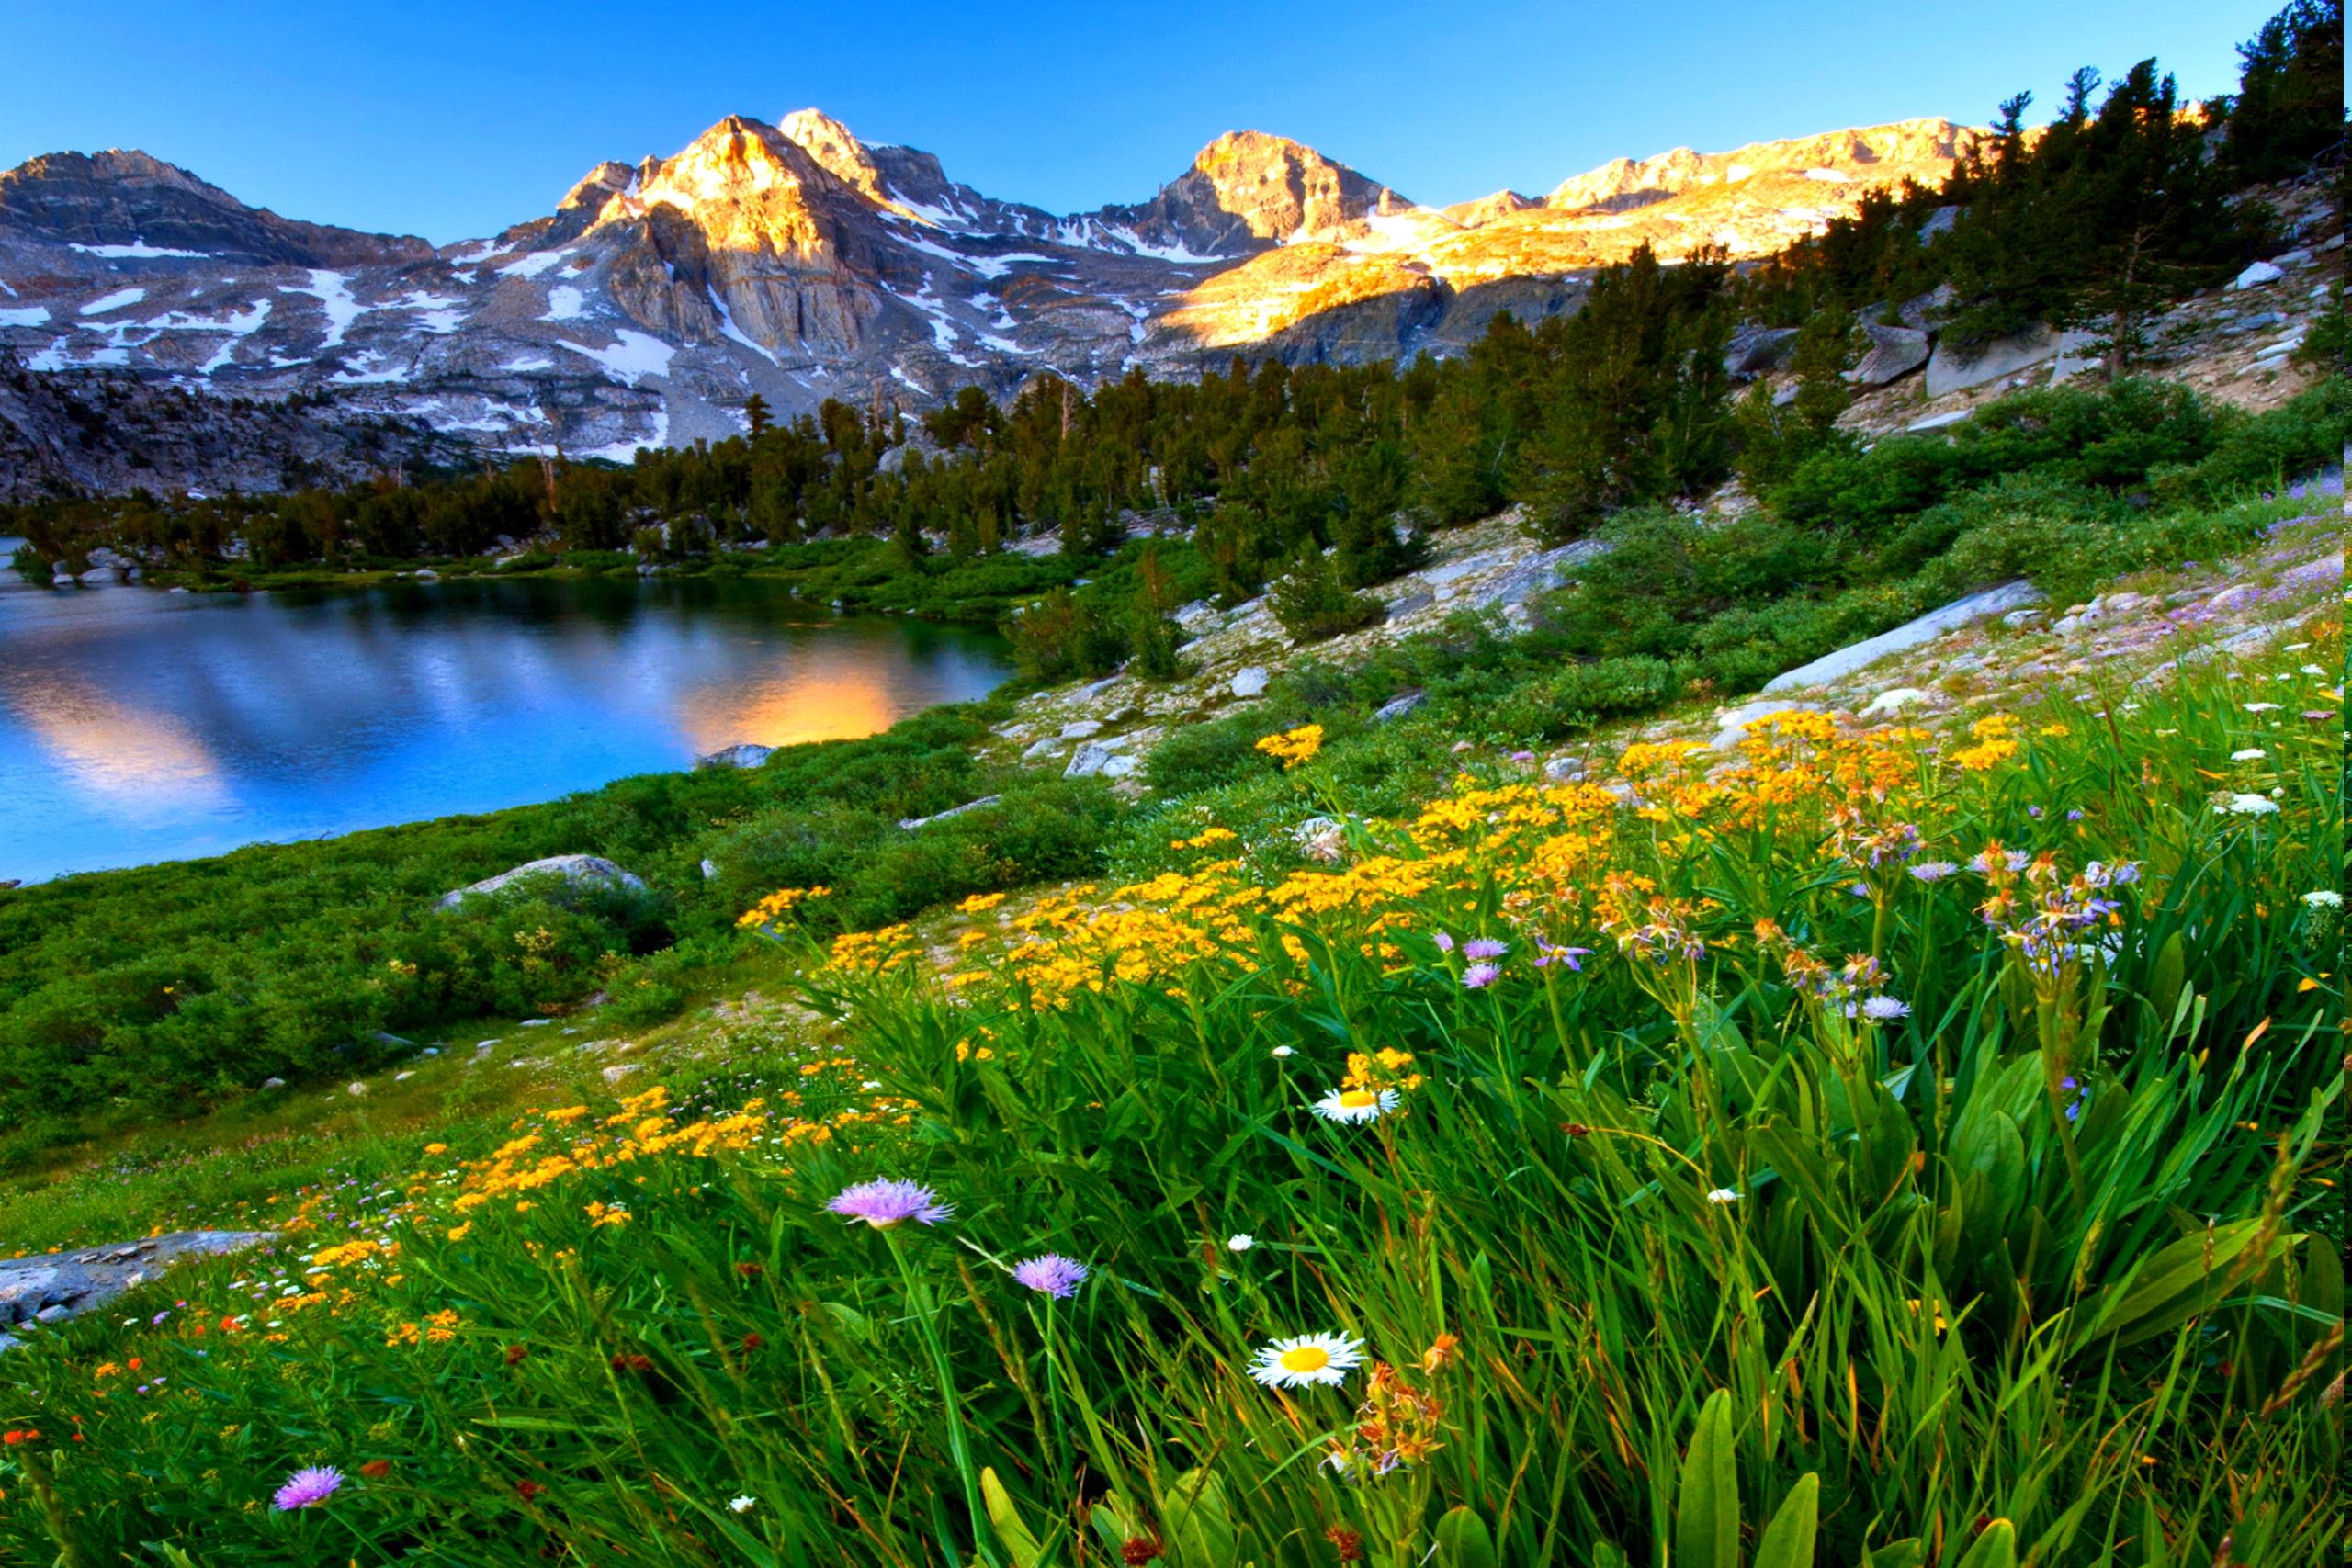 Free spring desktop wallpapers nexus wallpapersafari - Mountain screensavers free ...